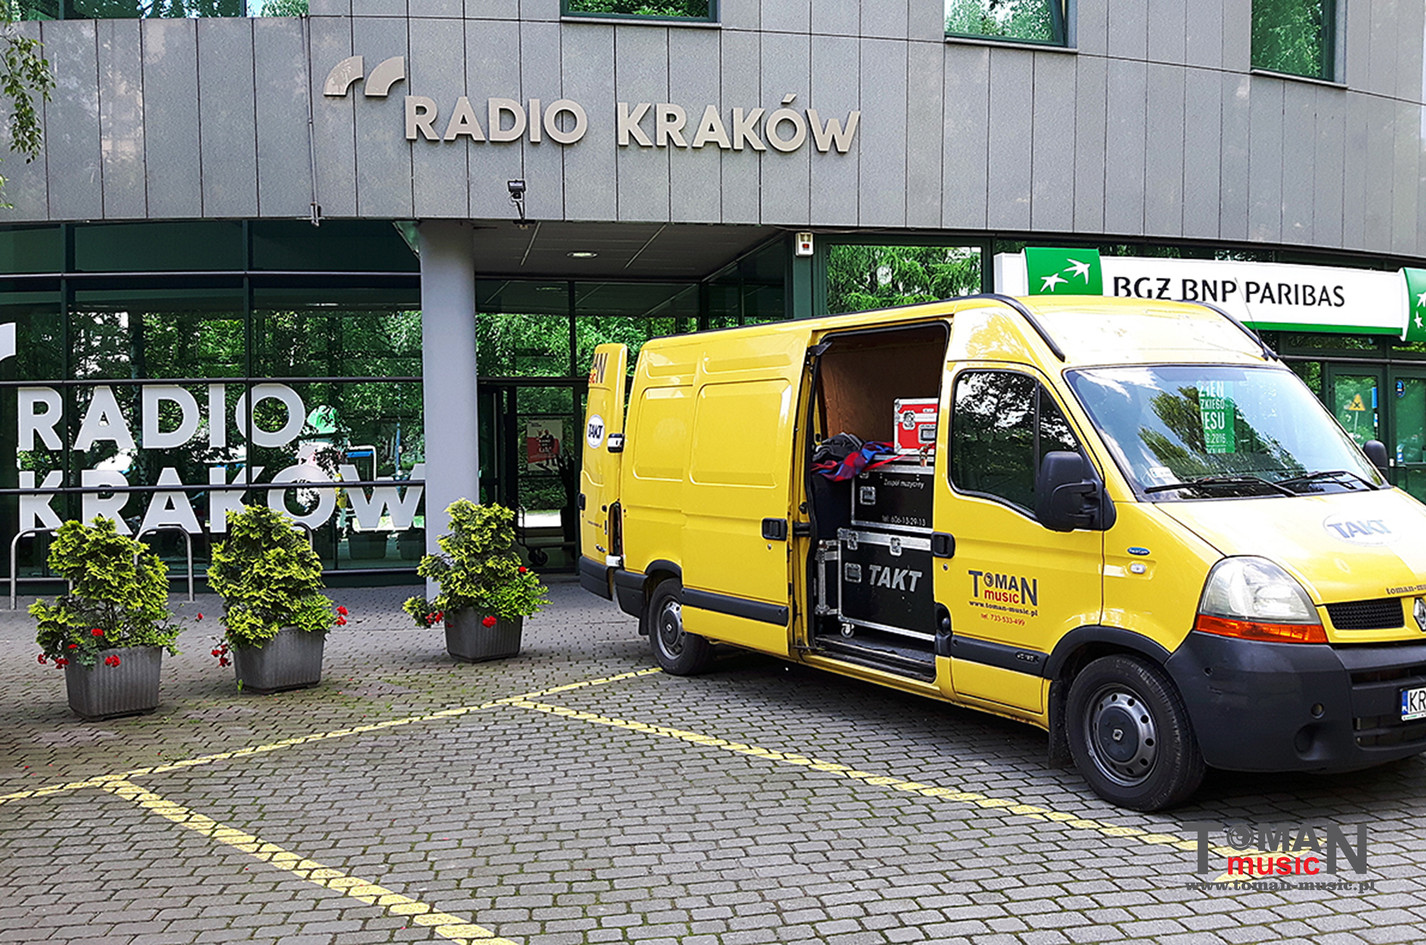 Radio_Krakow_Koncert_Toman_music.jpg